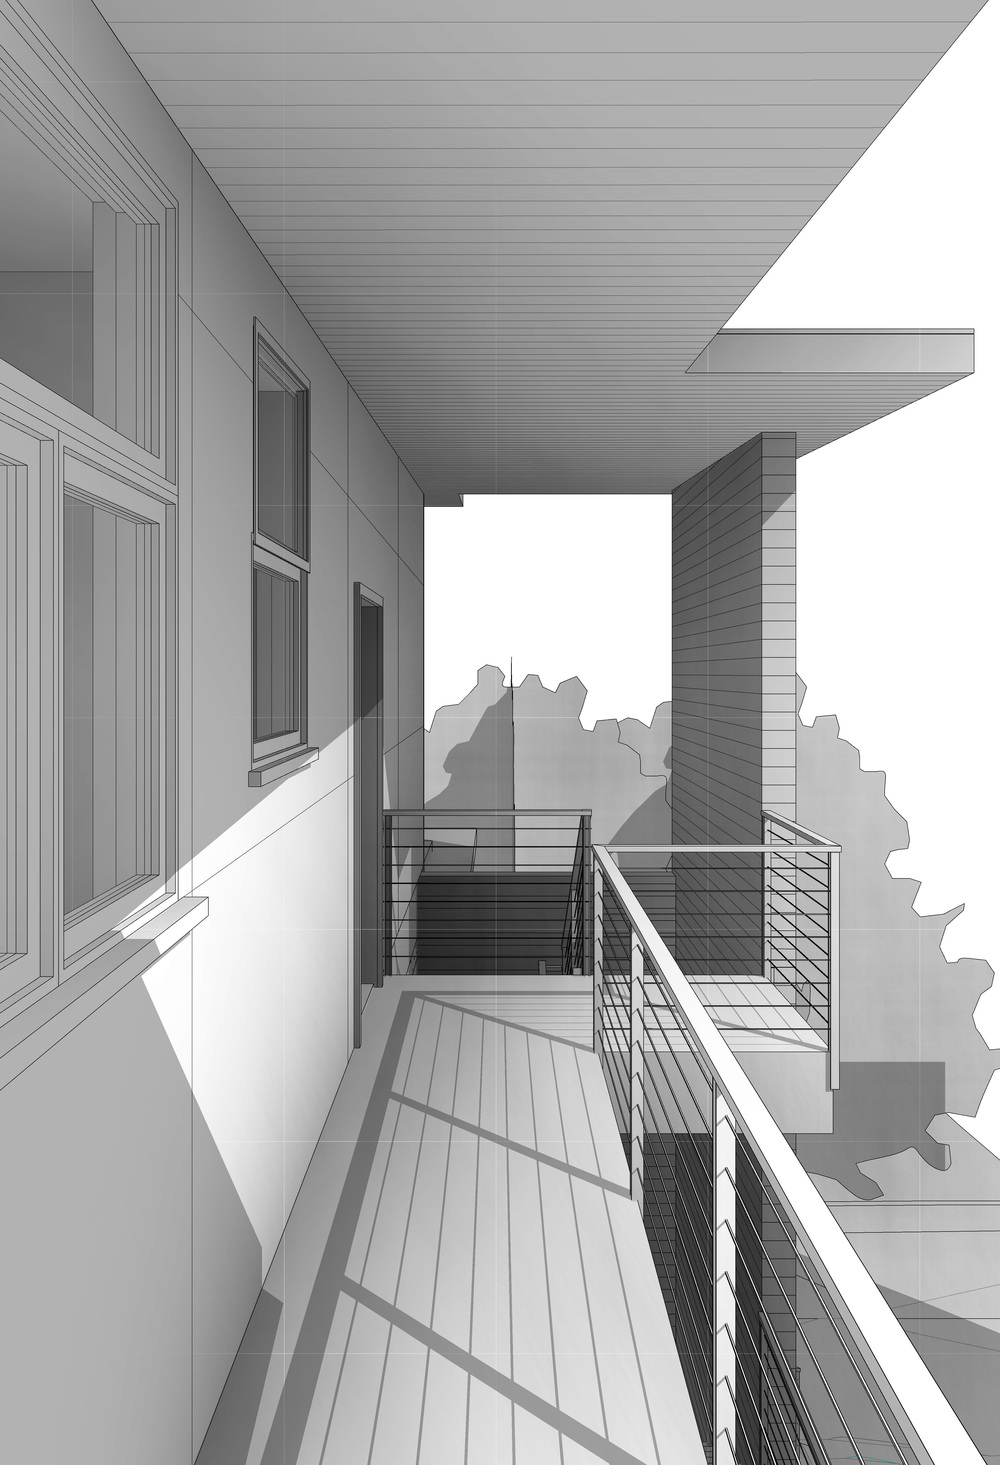 04a - Perspective 3rd Floor.jpg